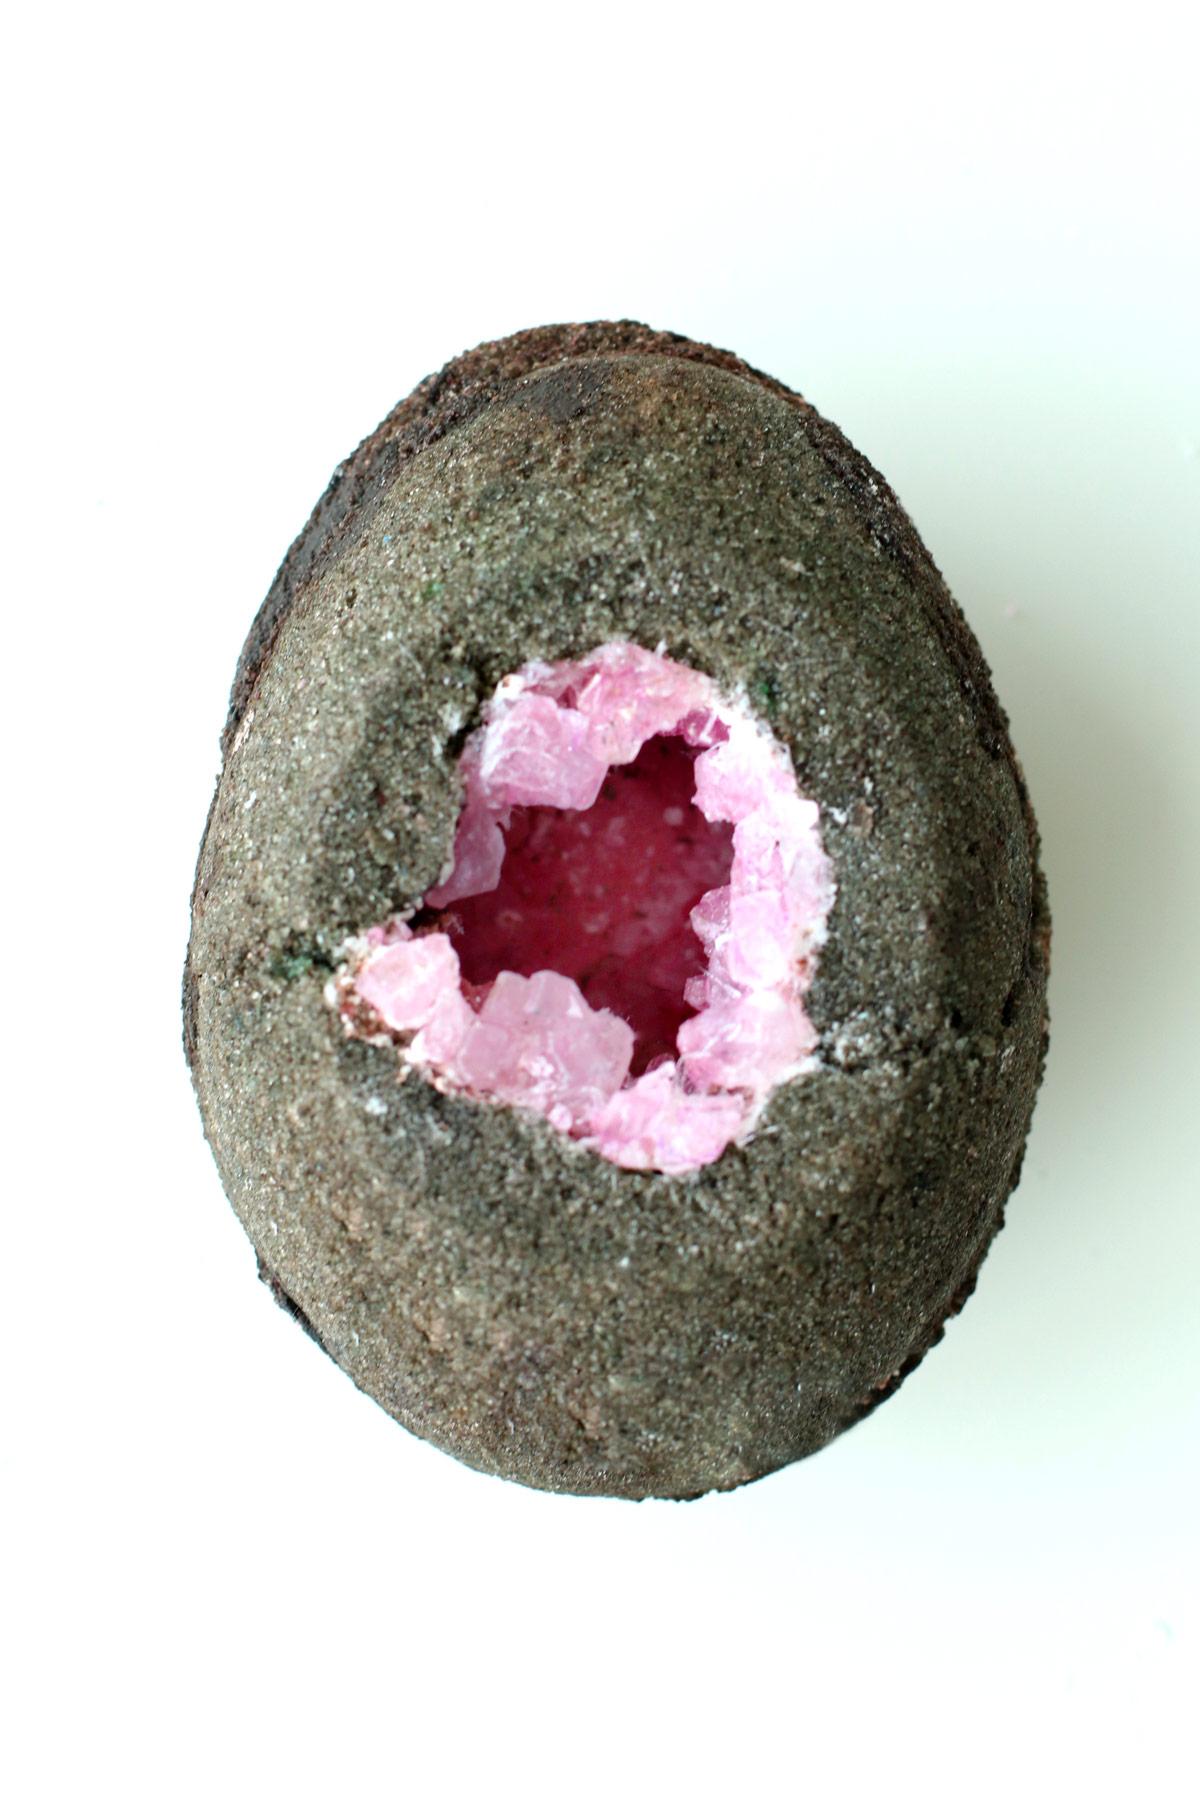 Geode Sugar Egg